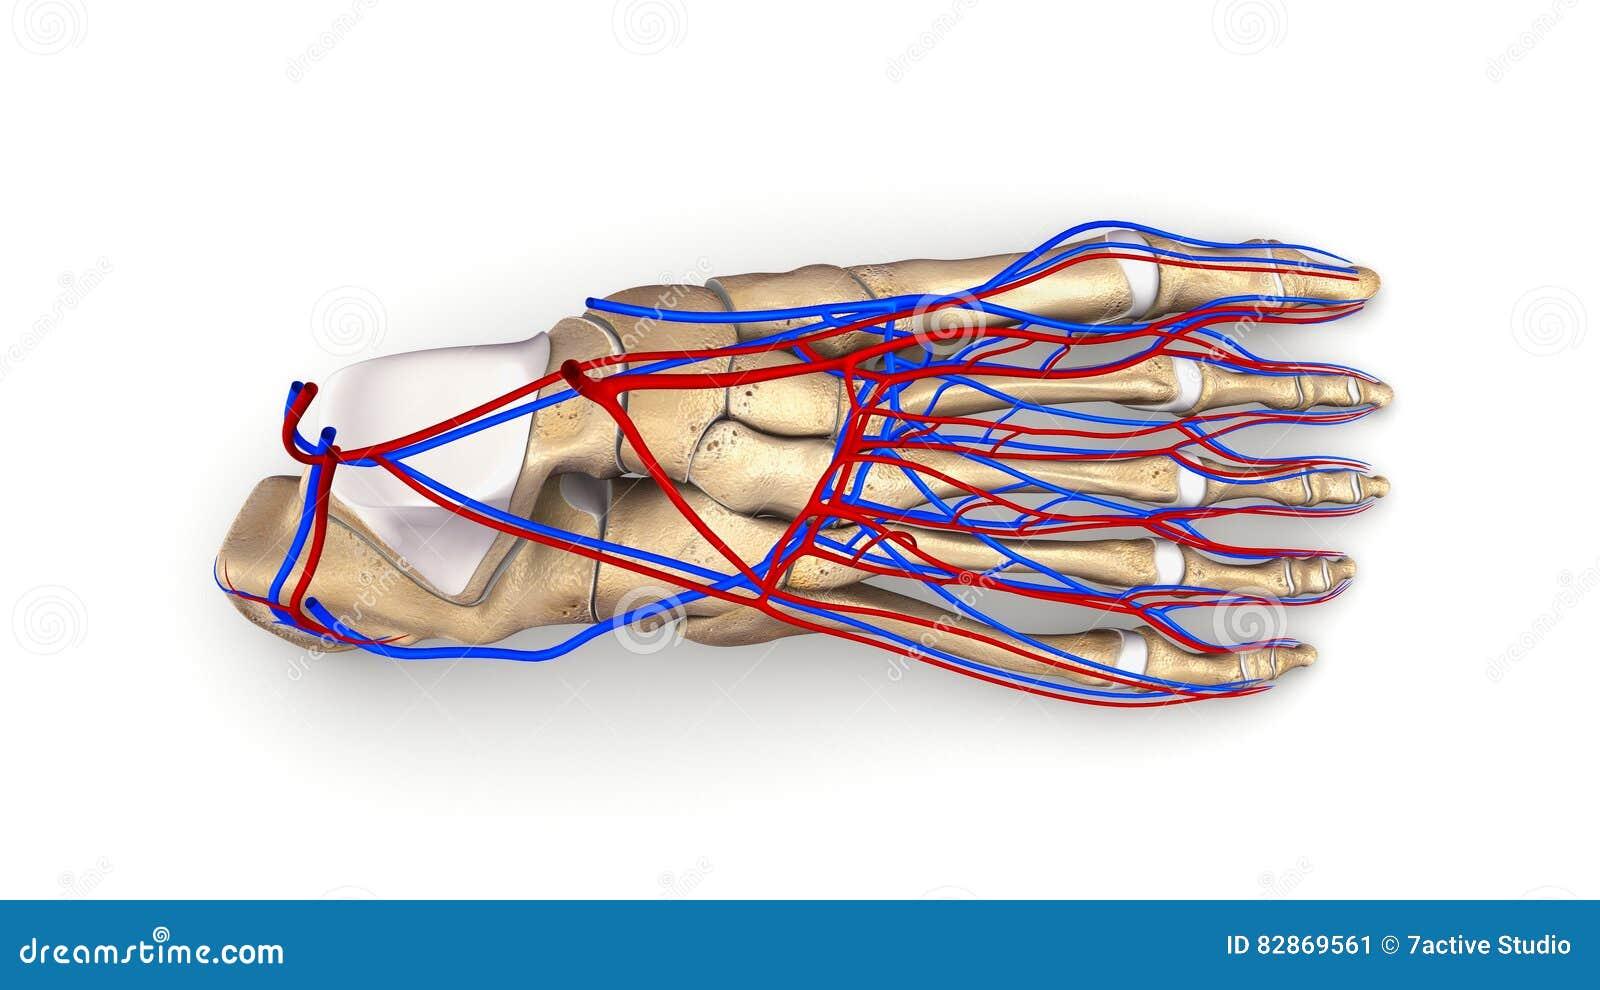 Metatarsals Bones Anatomy Circulatory System